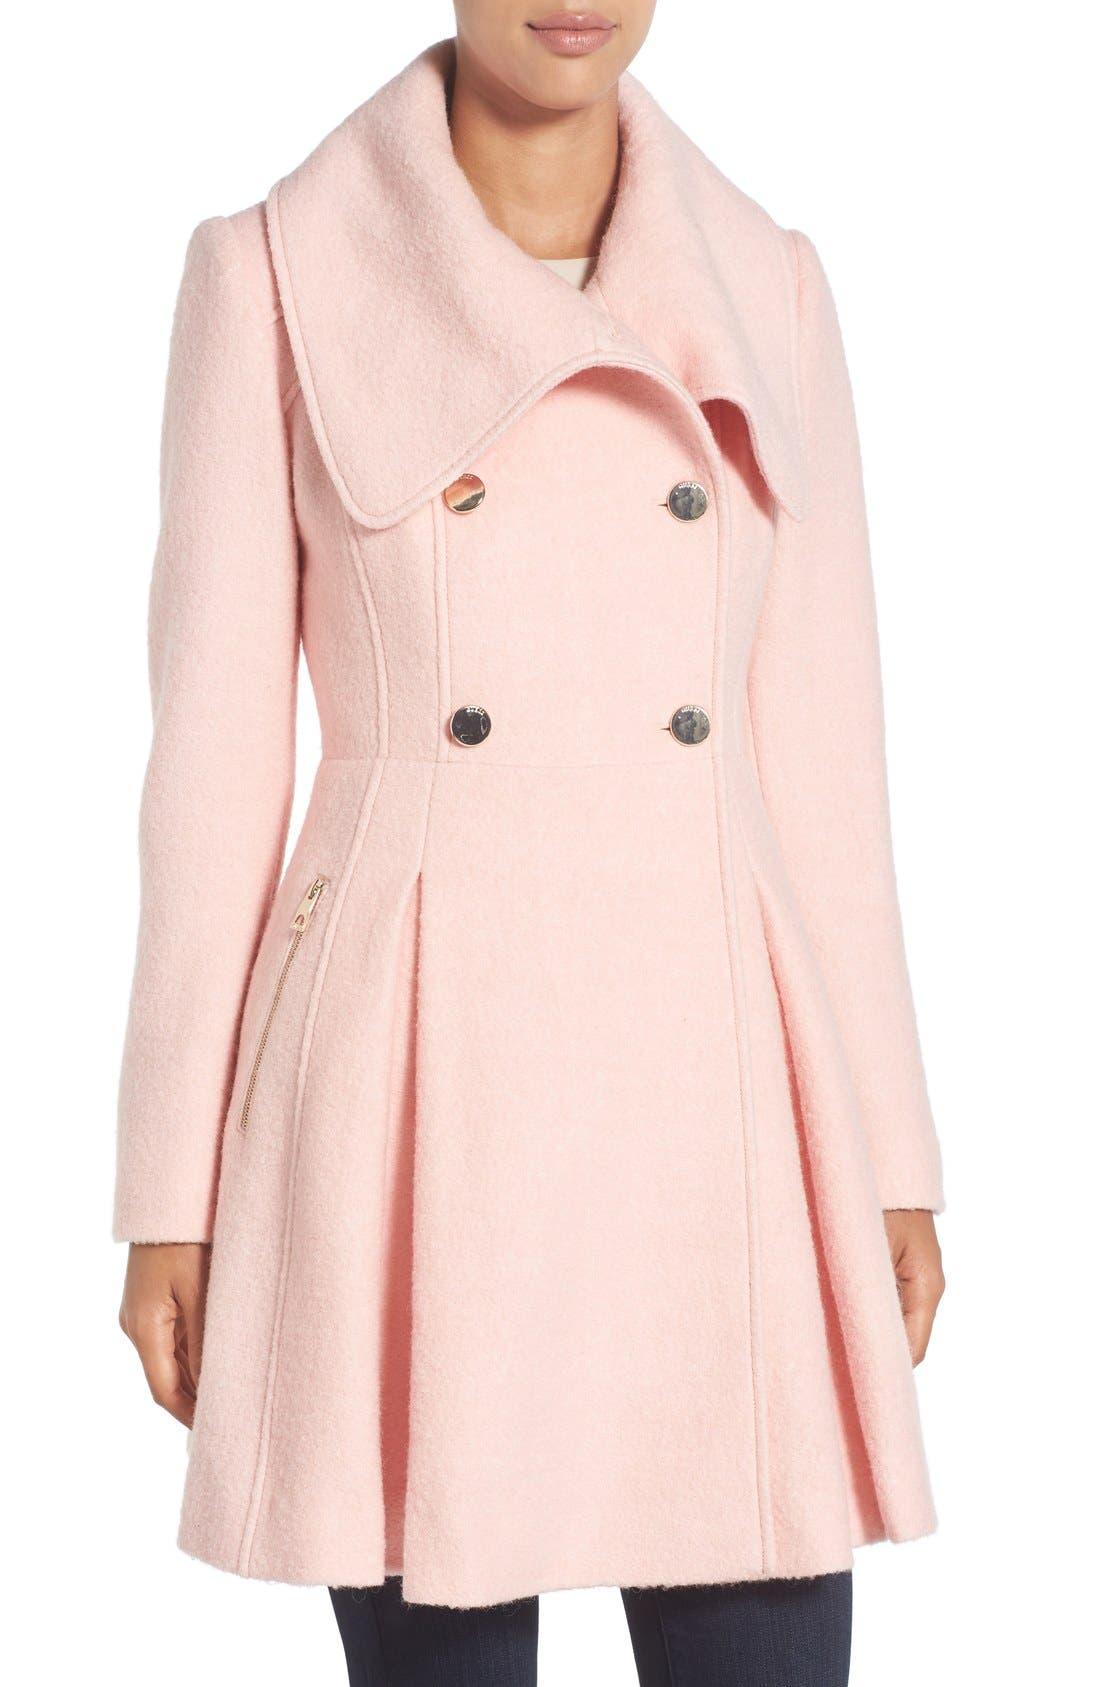 Alternate Image 1 Selected - GUESS Envelope Collar Double Breasted Coat (Regular & Petite)